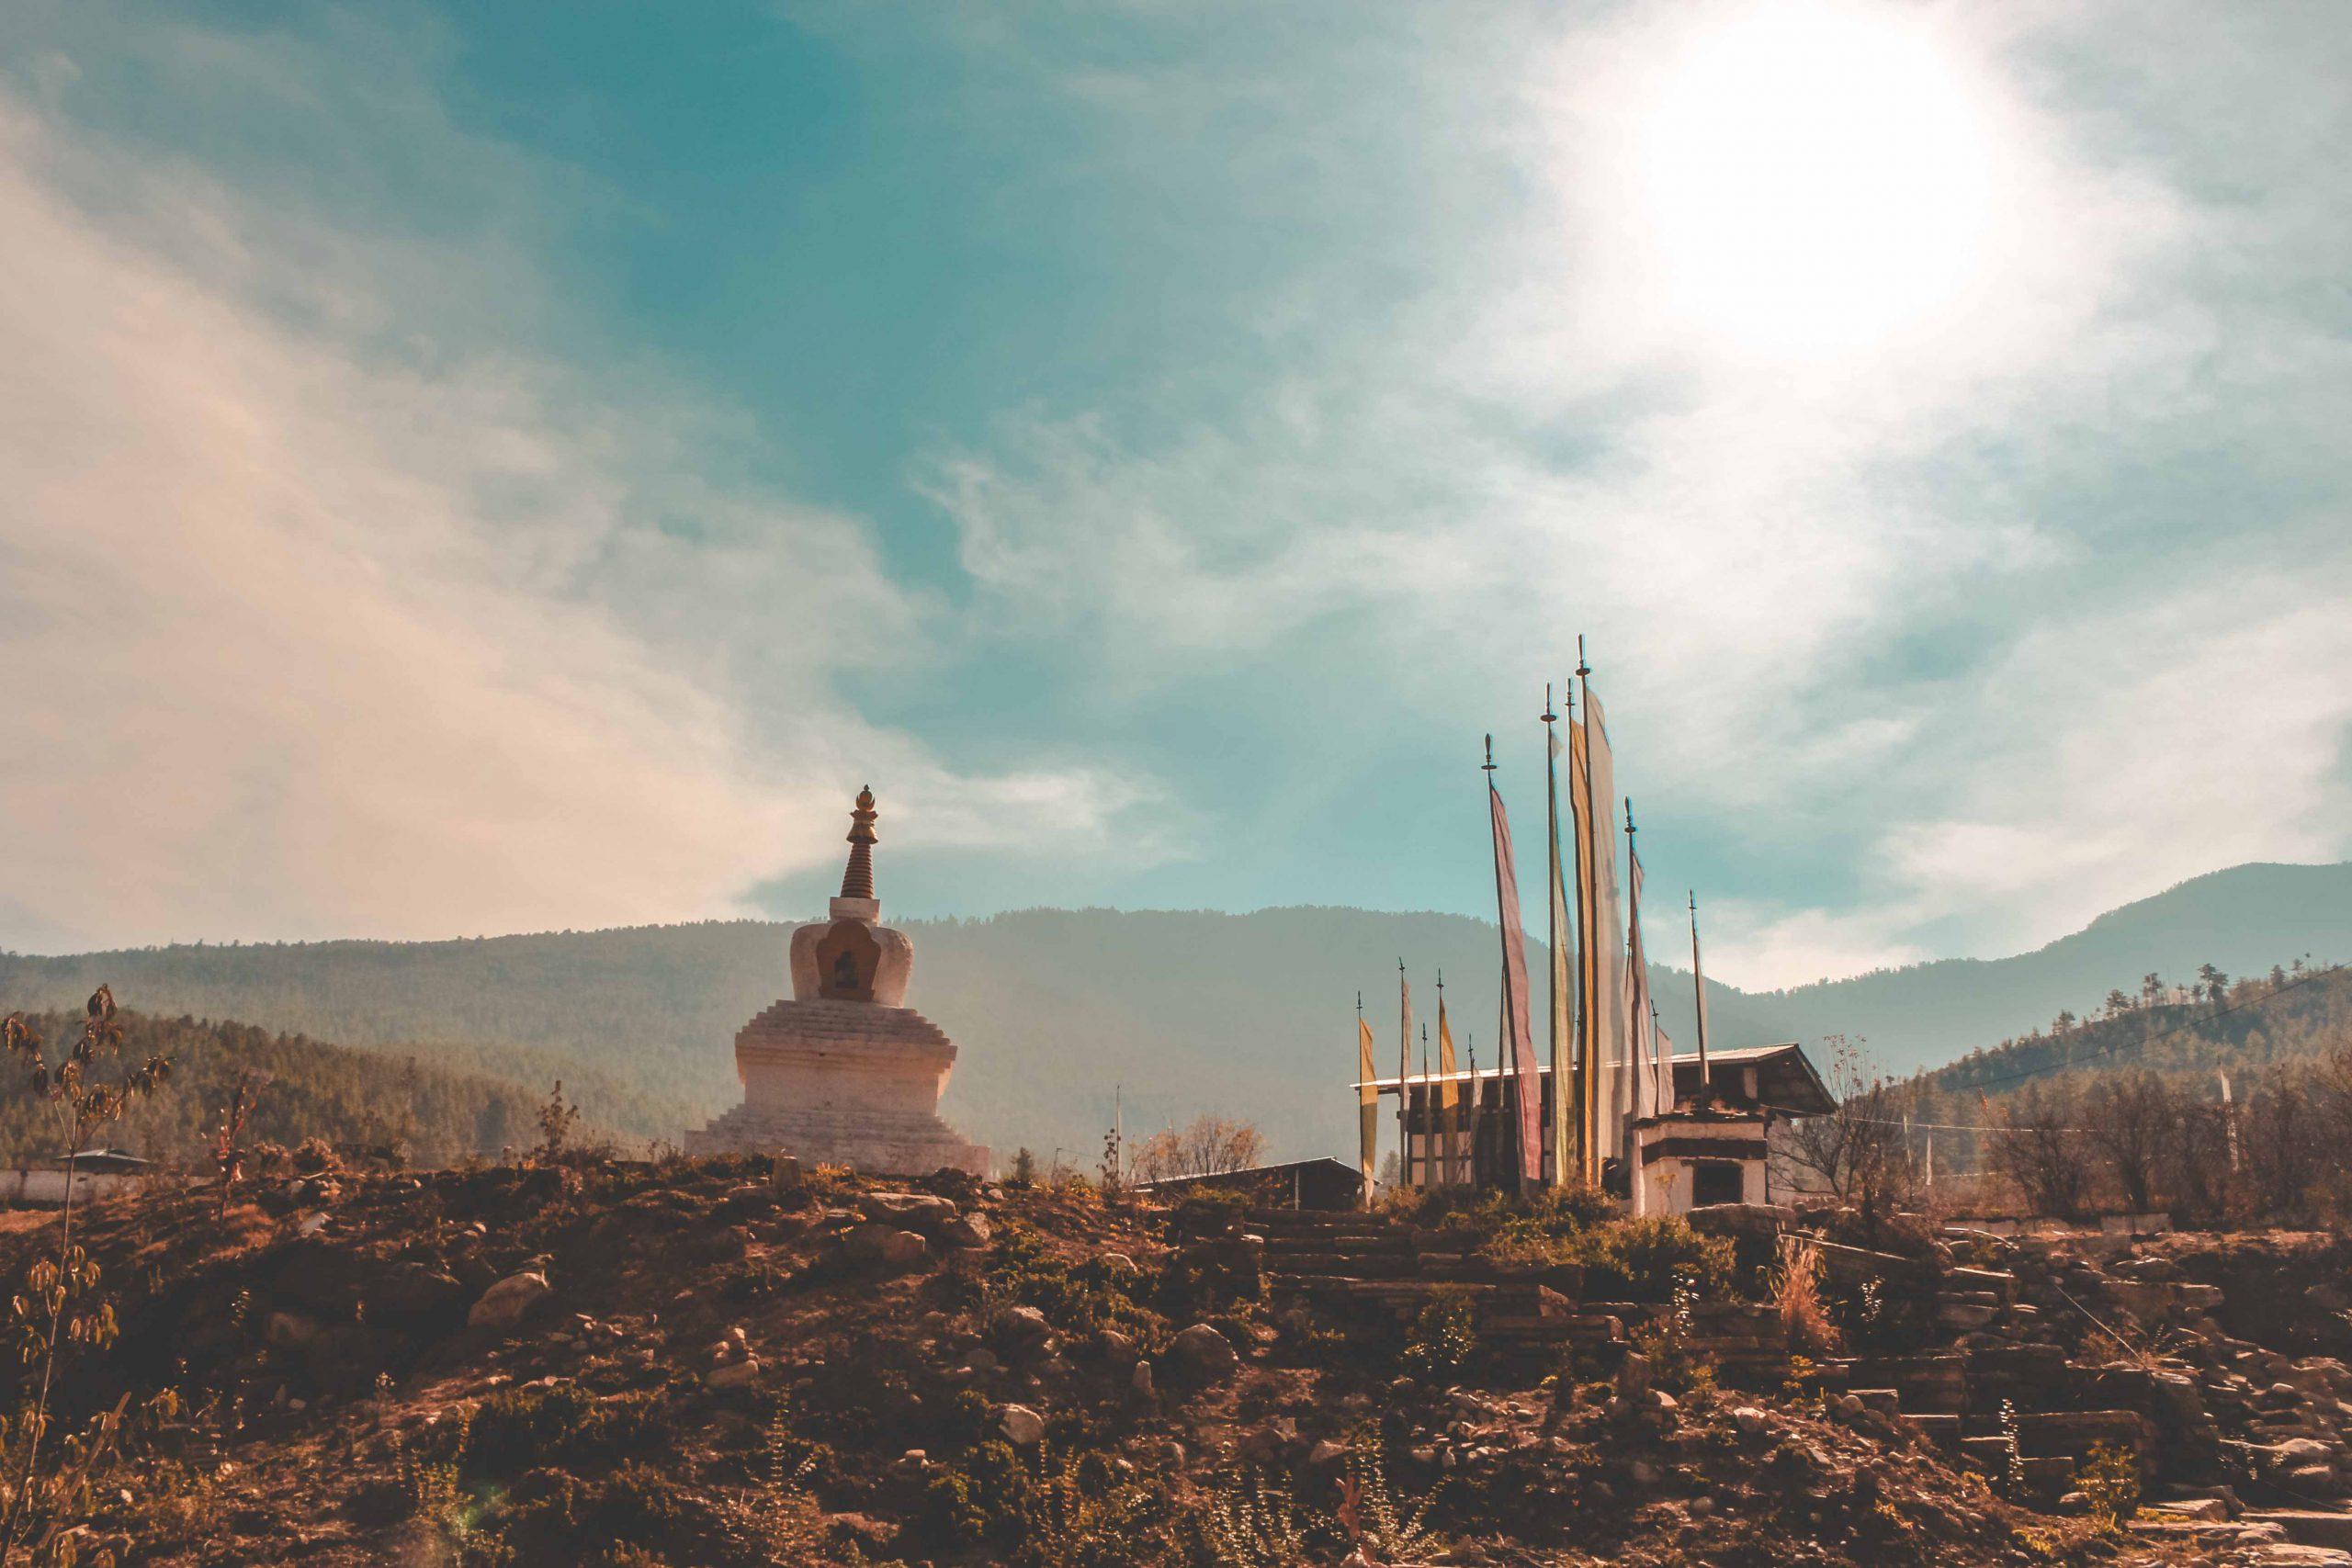 Bhutan: Kingdom of the Sky